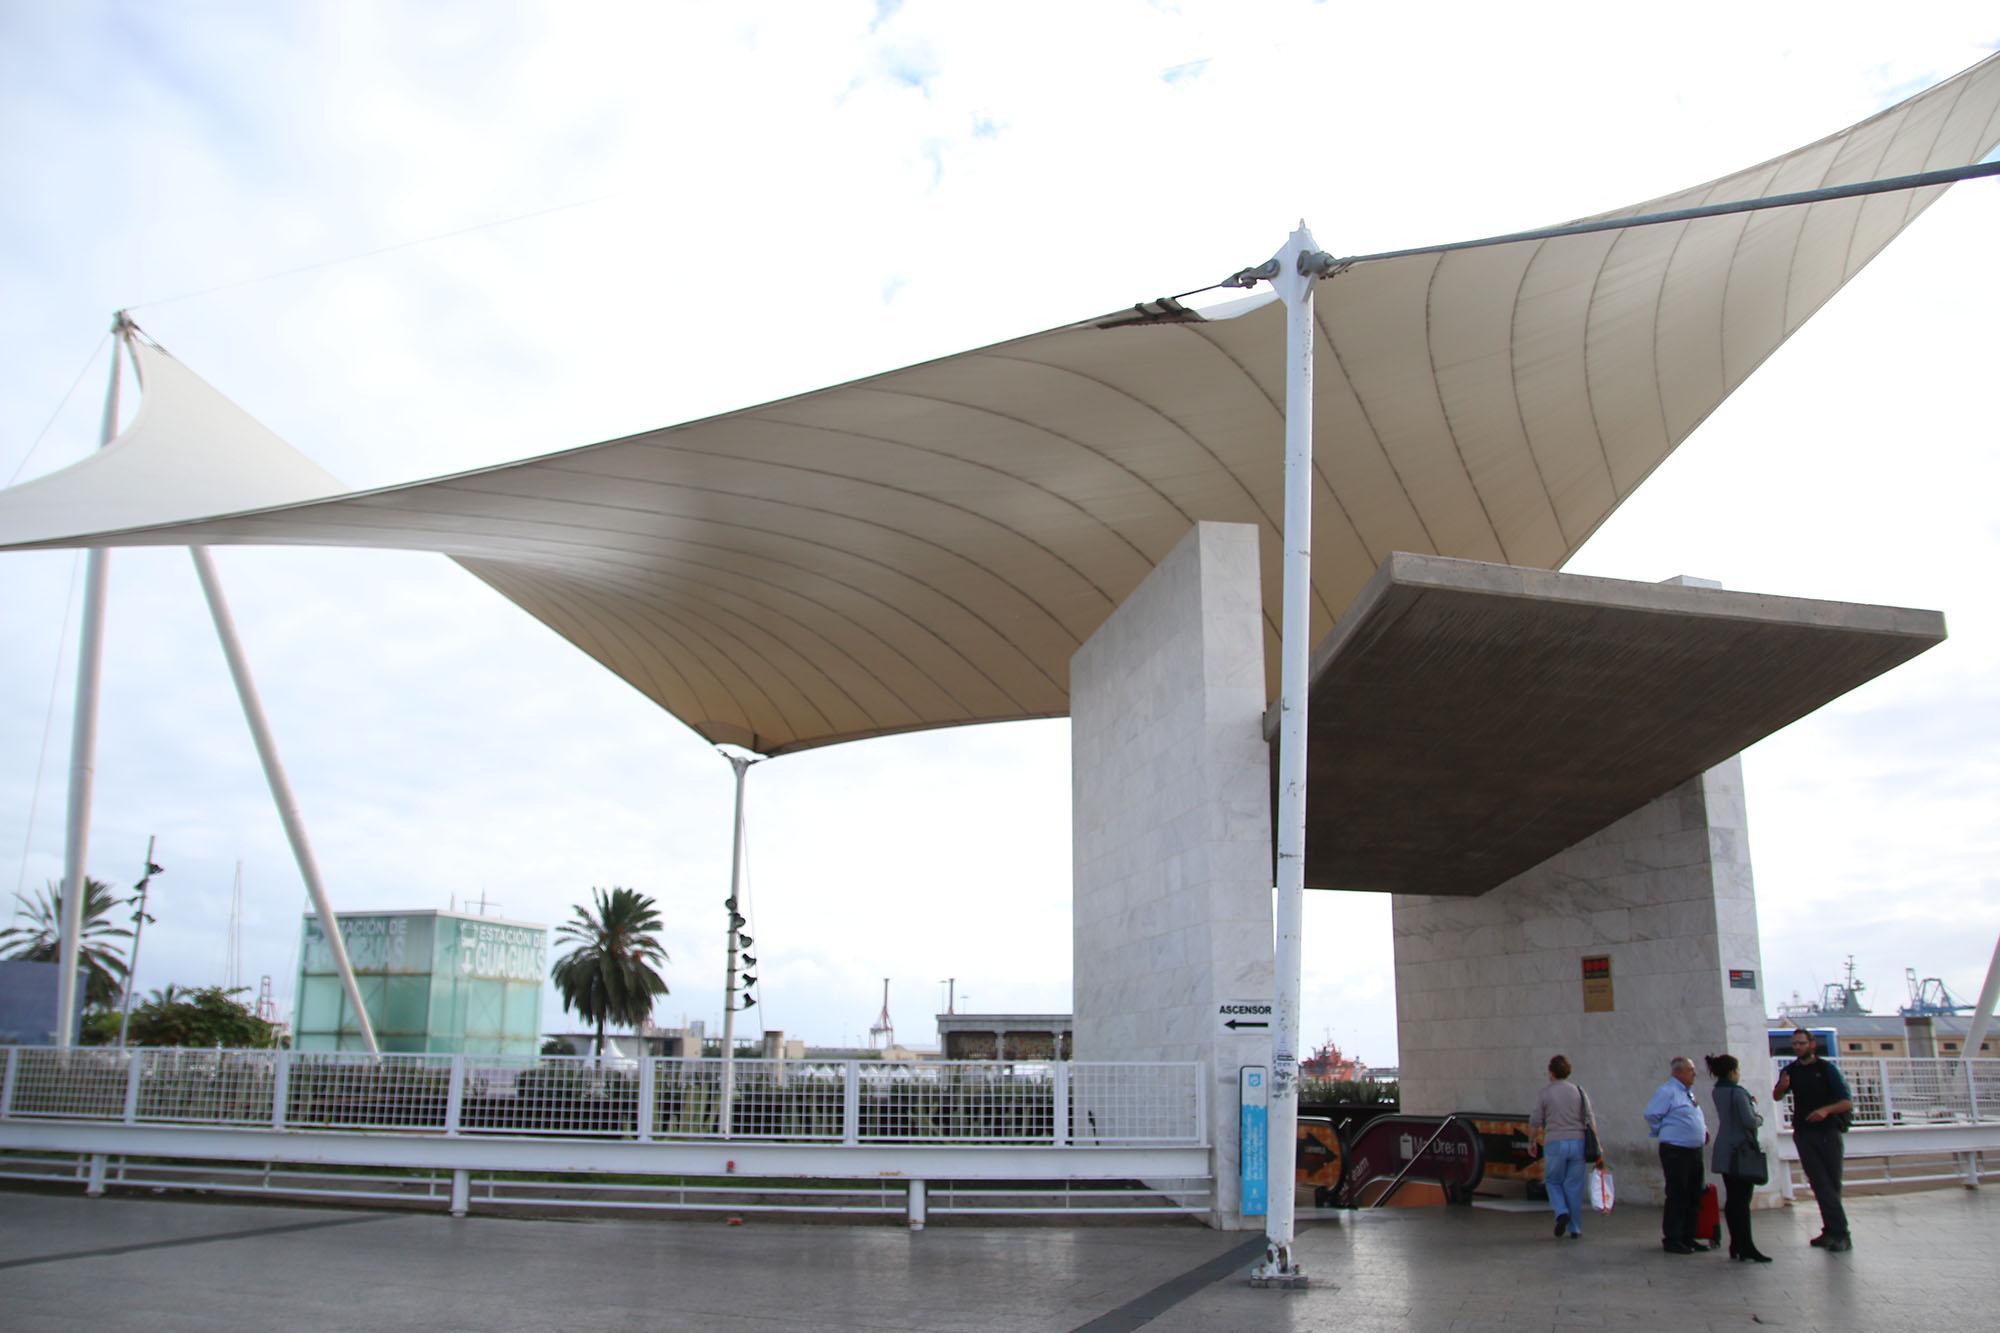 img_7345-busstation